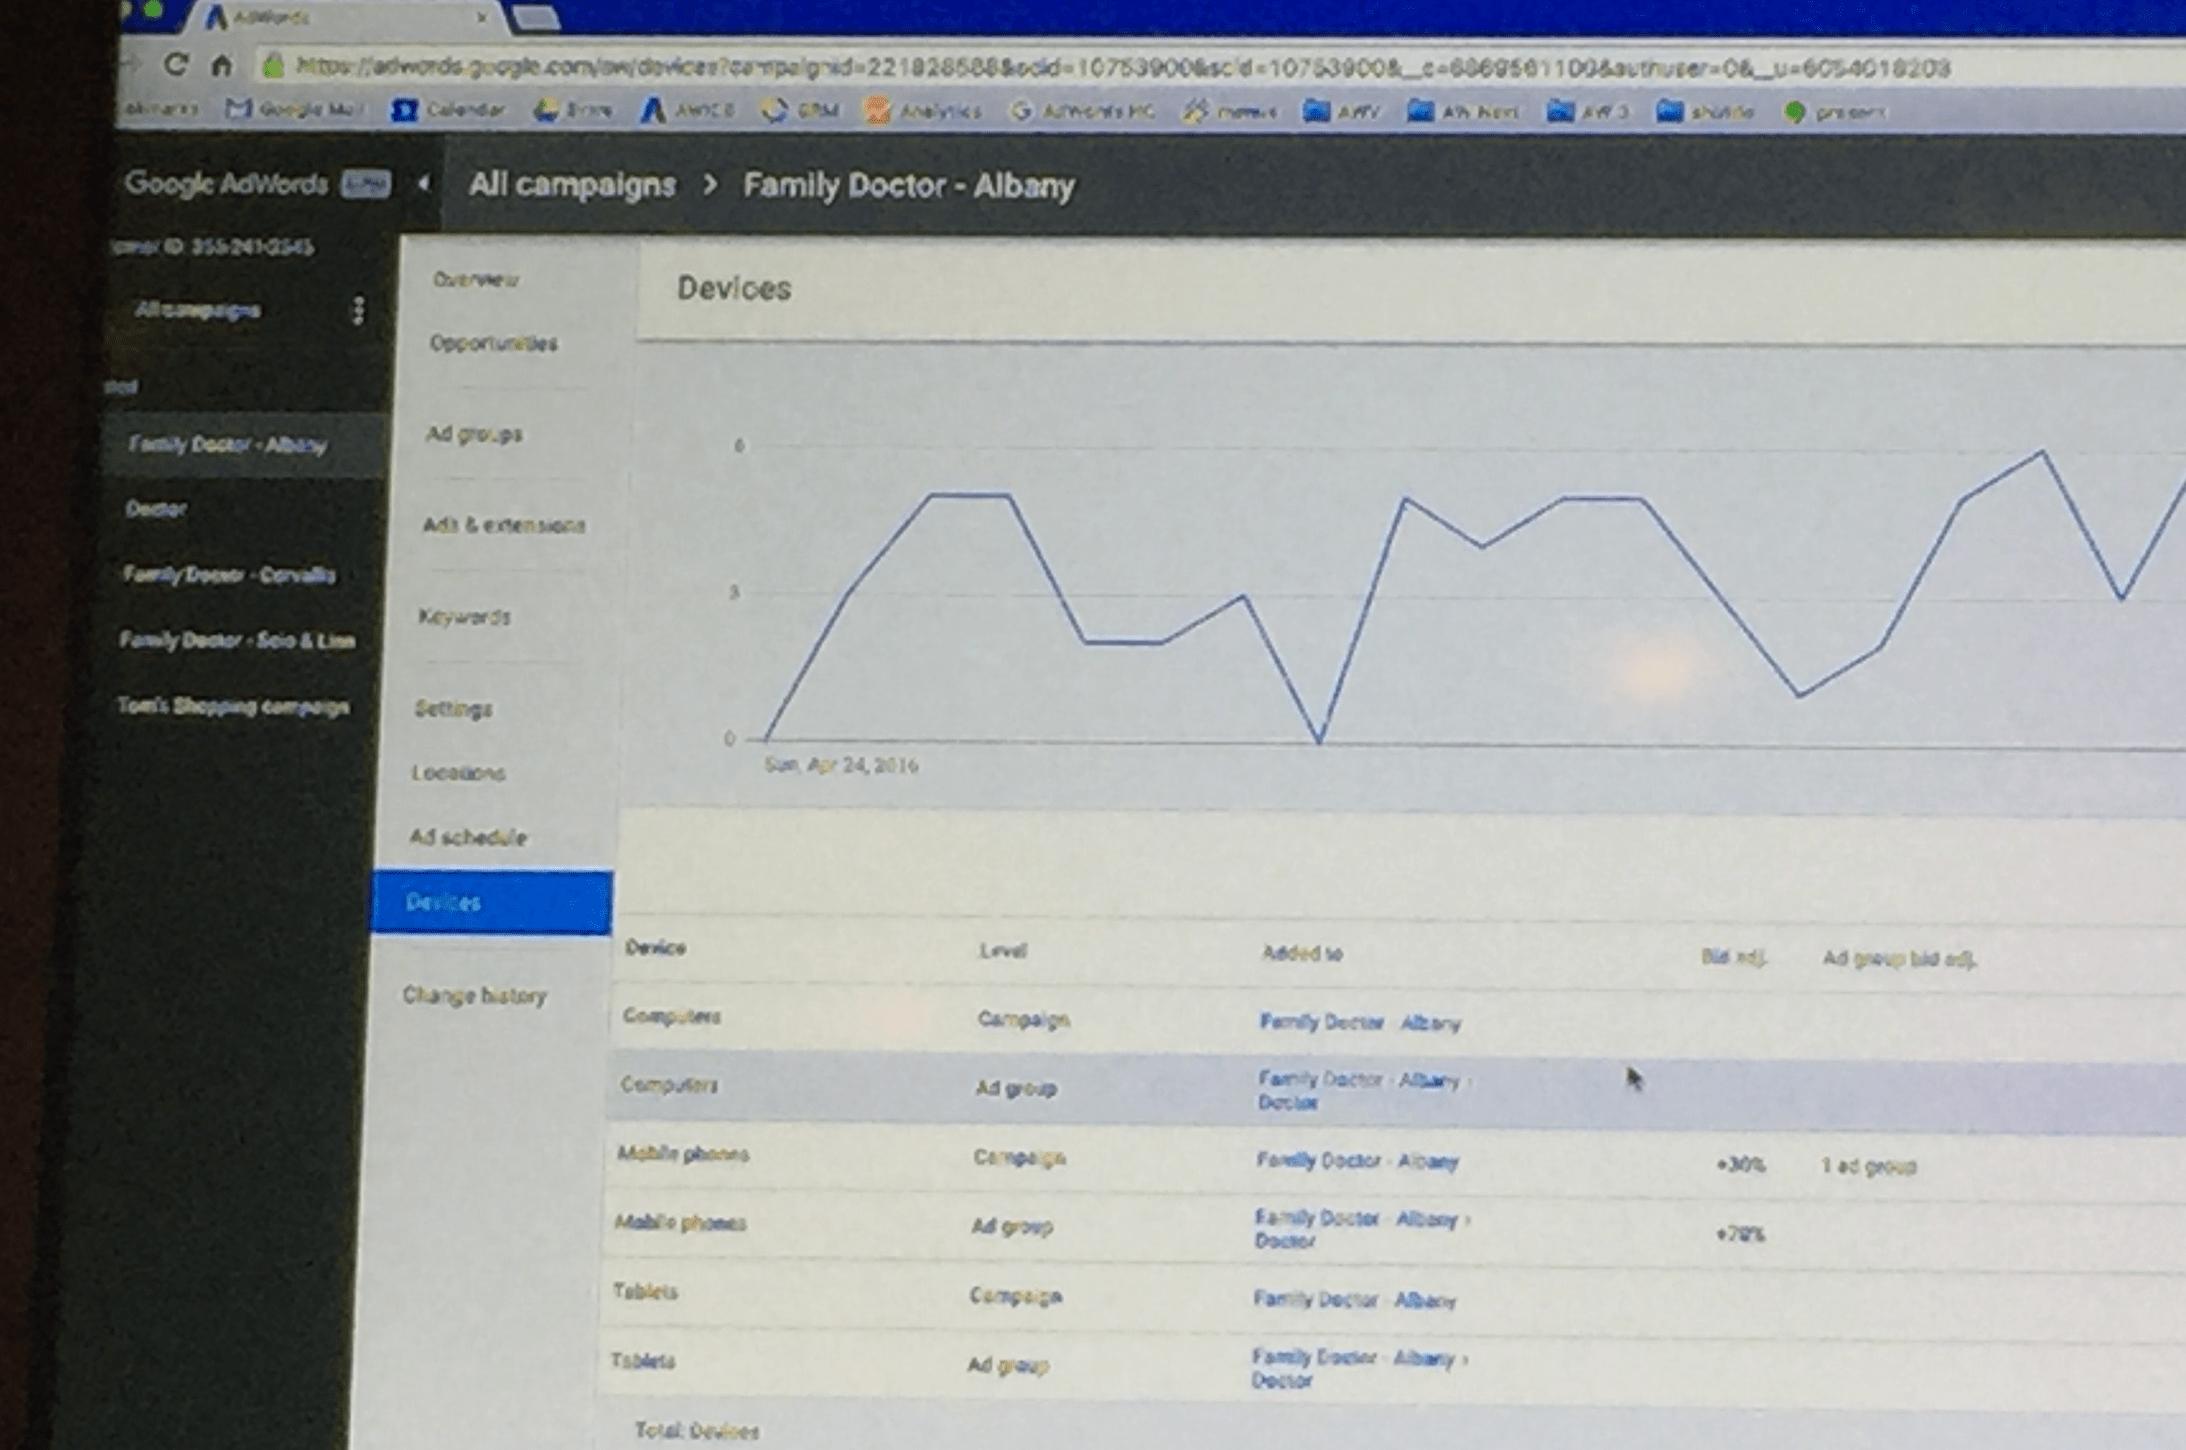 New AdWords interface device summary